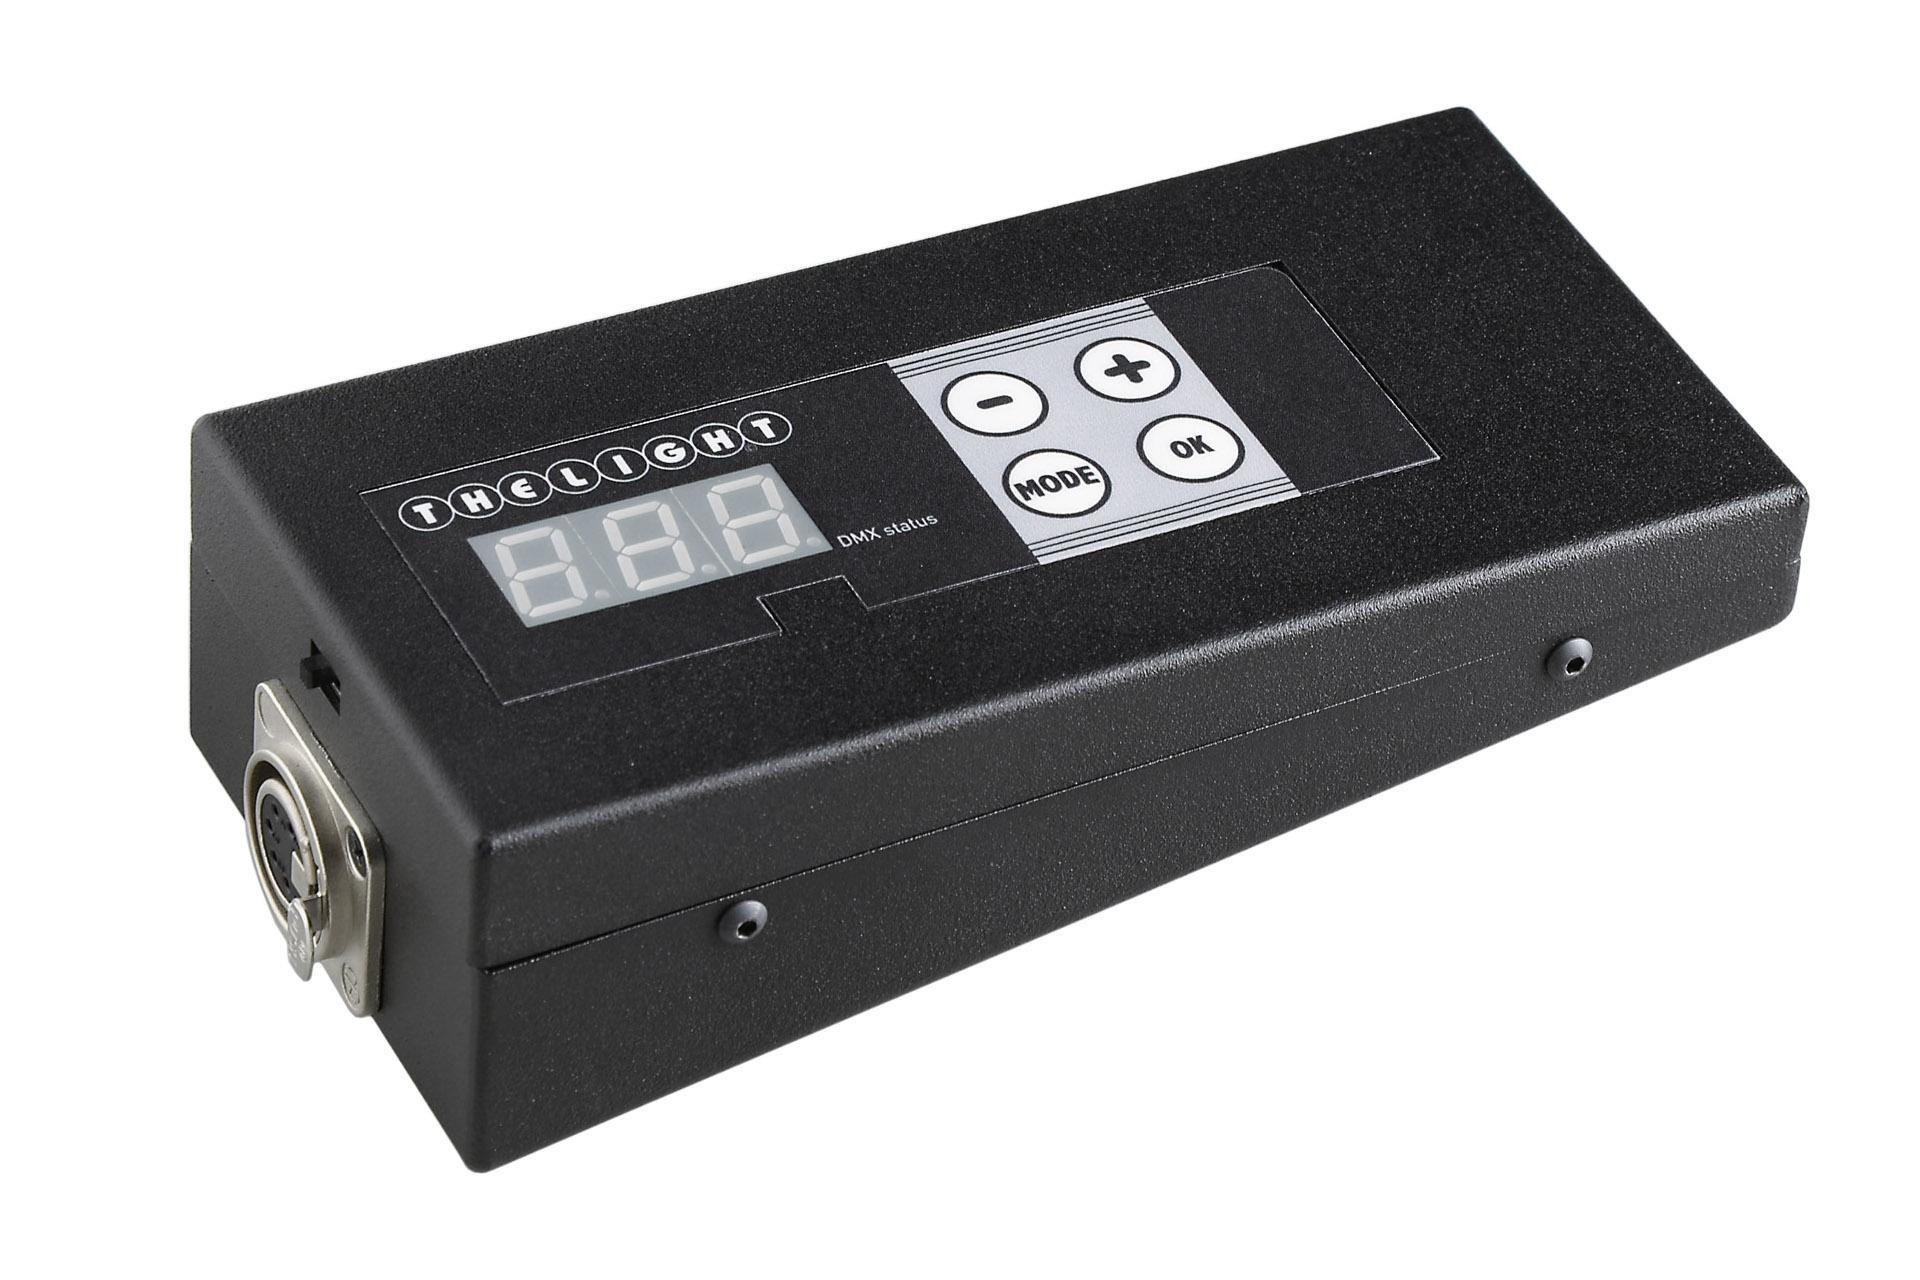 VELVET DMX Remote control